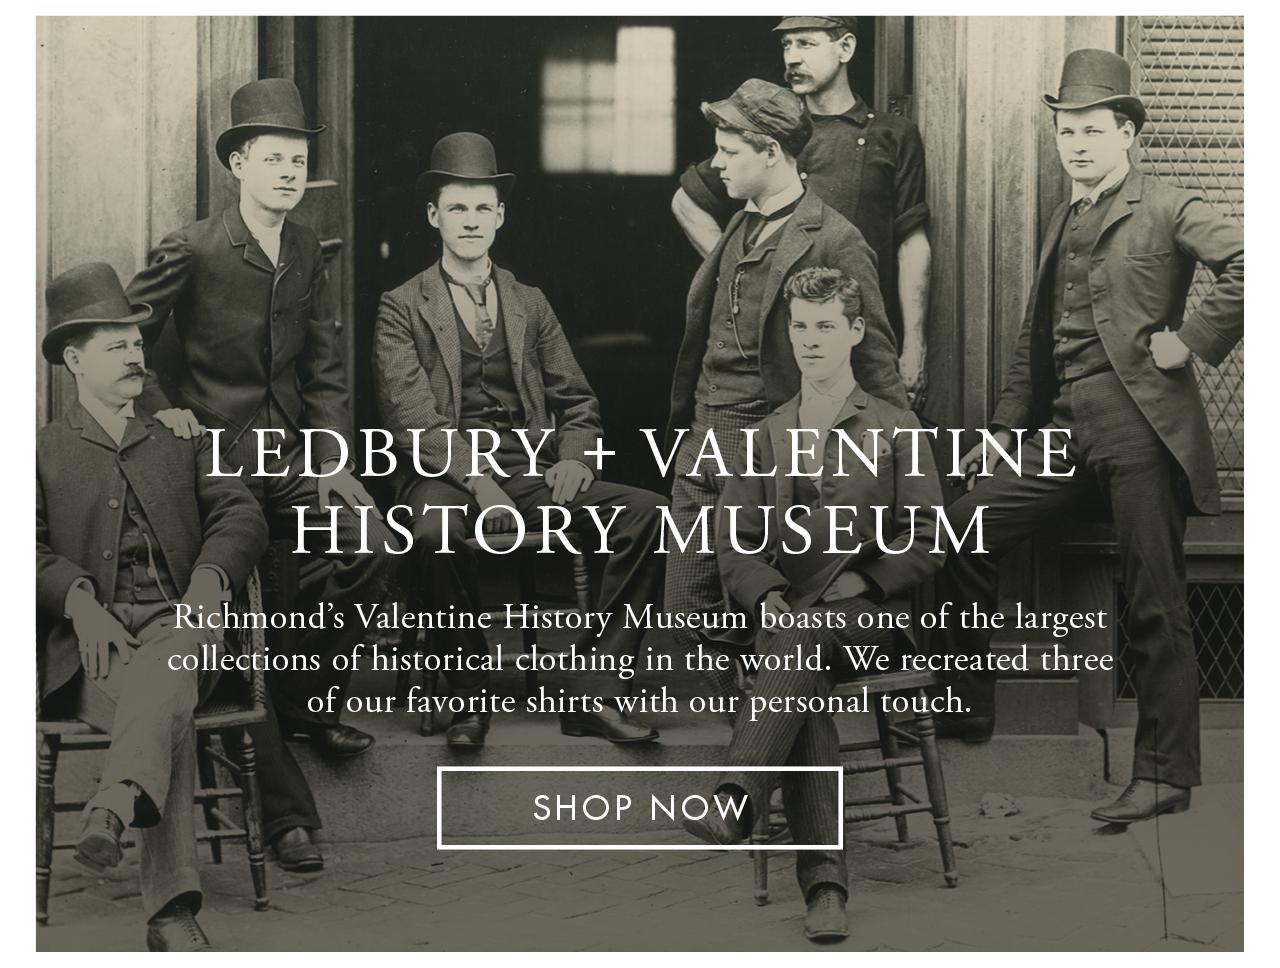 Ledbury + The Valentine Museum